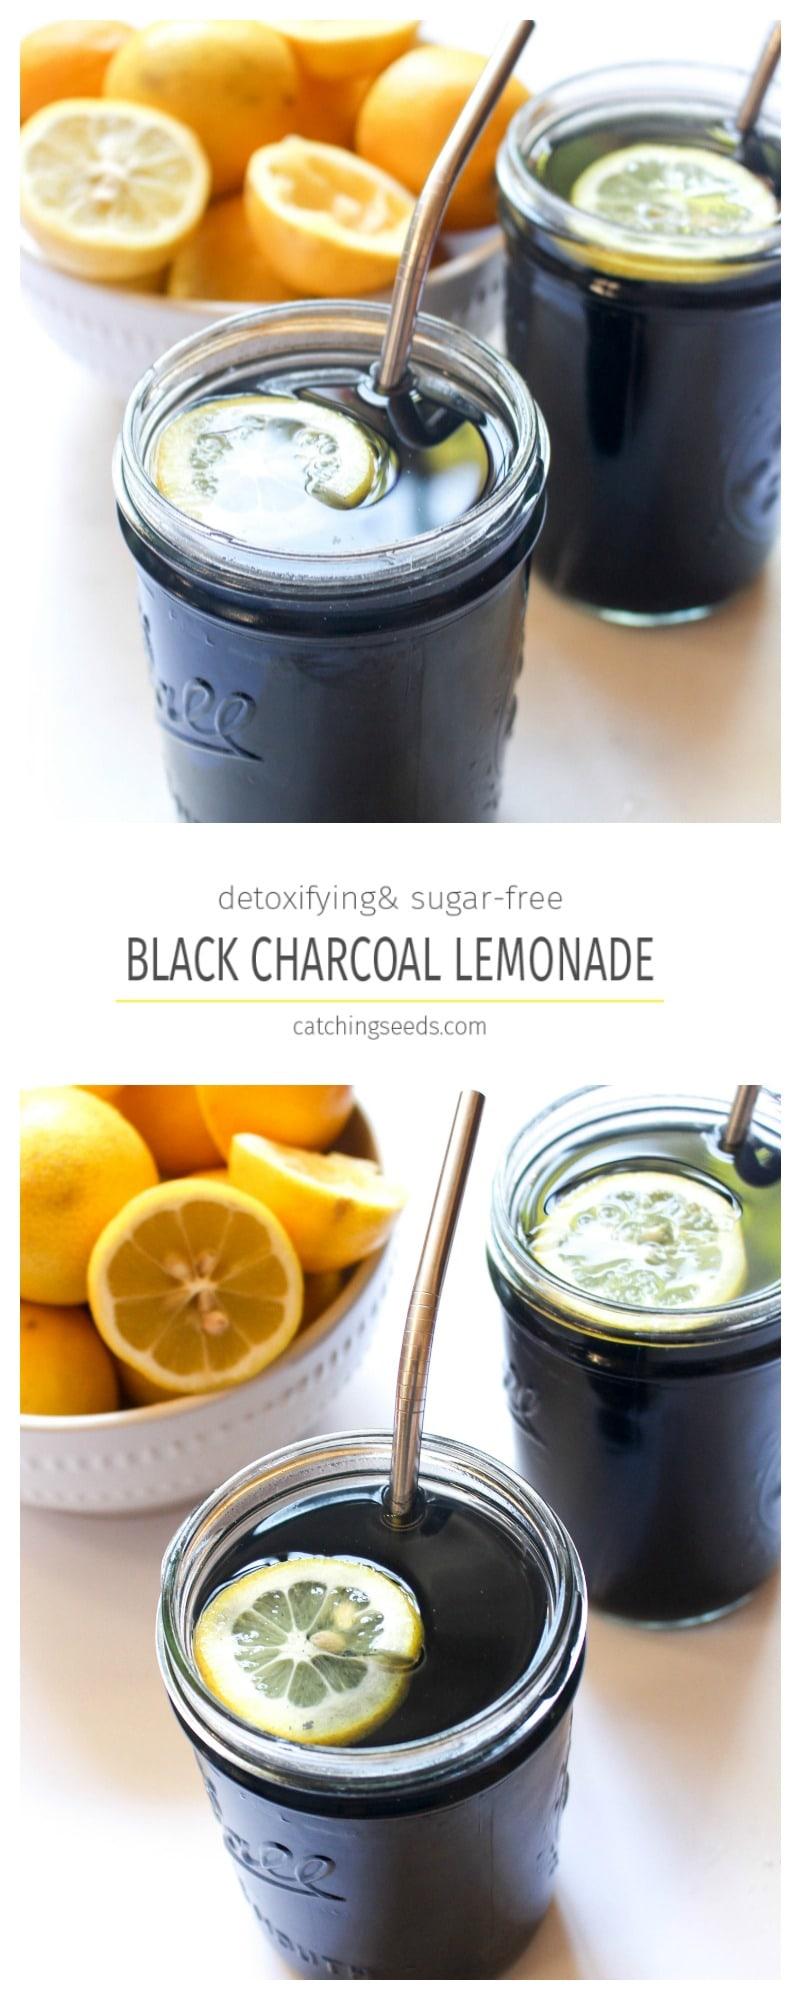 This powerful detox drink tastes just like lemonade!